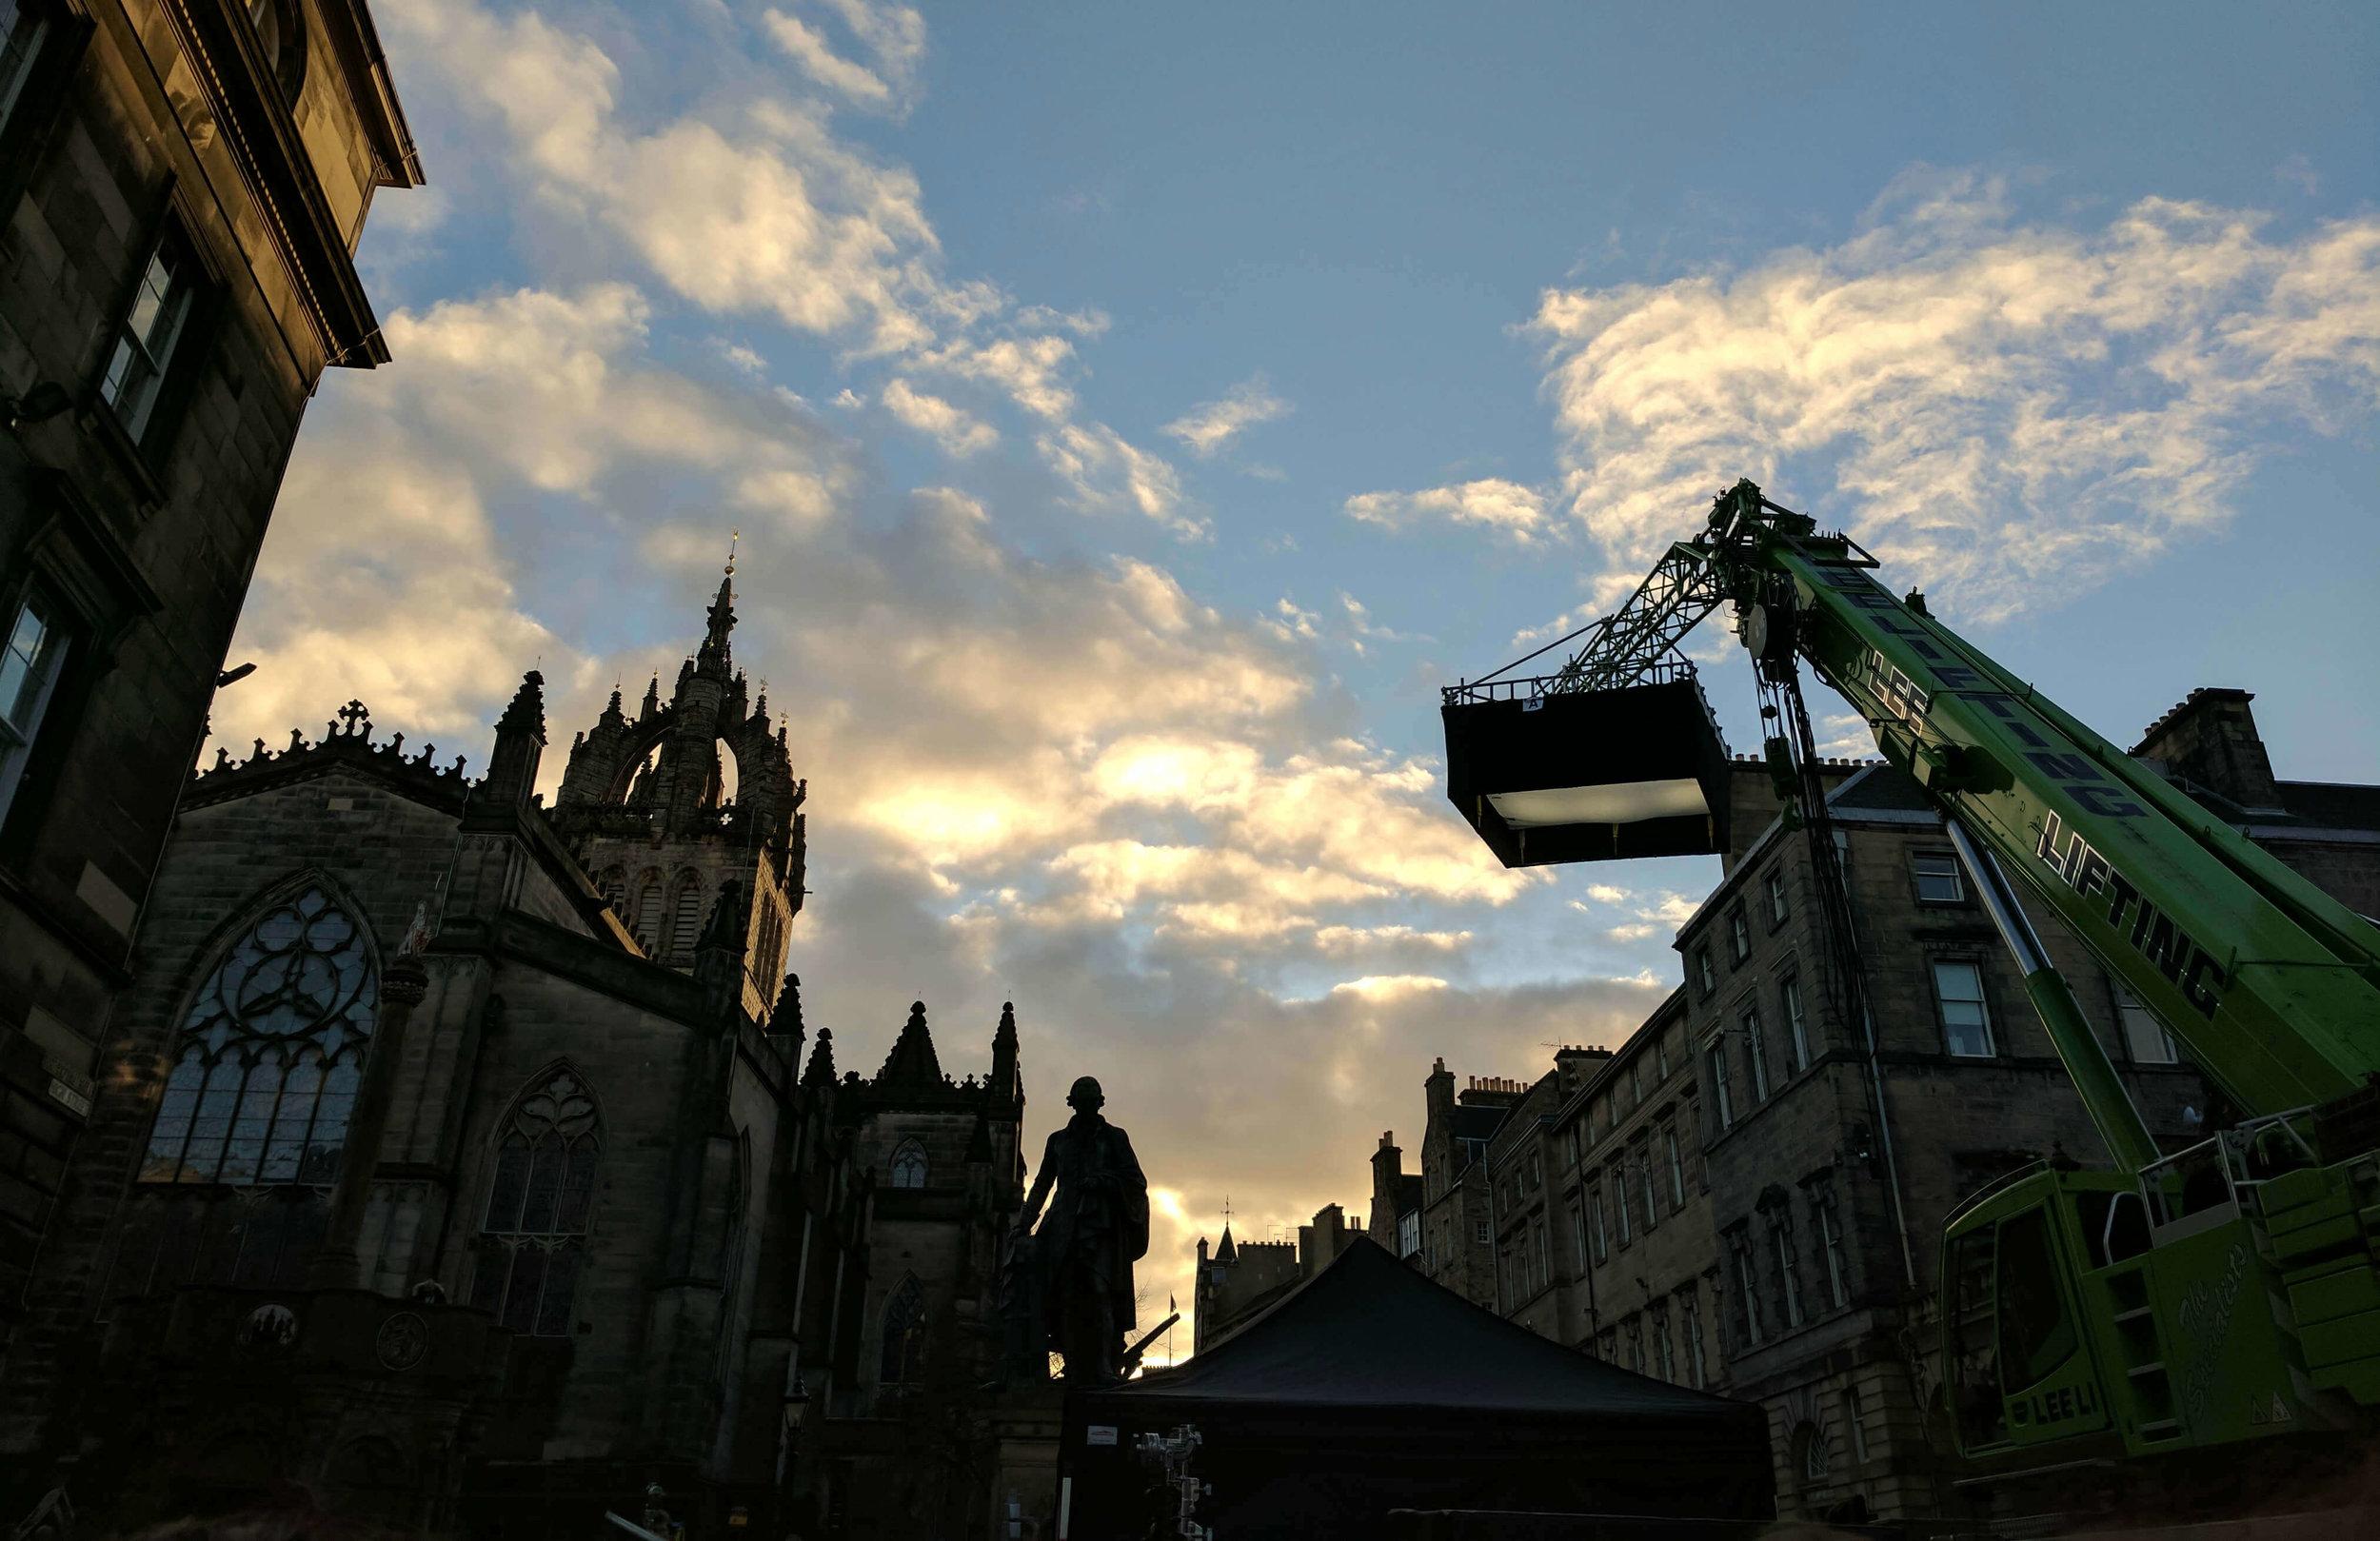 Don't forget to explore Edinburgh